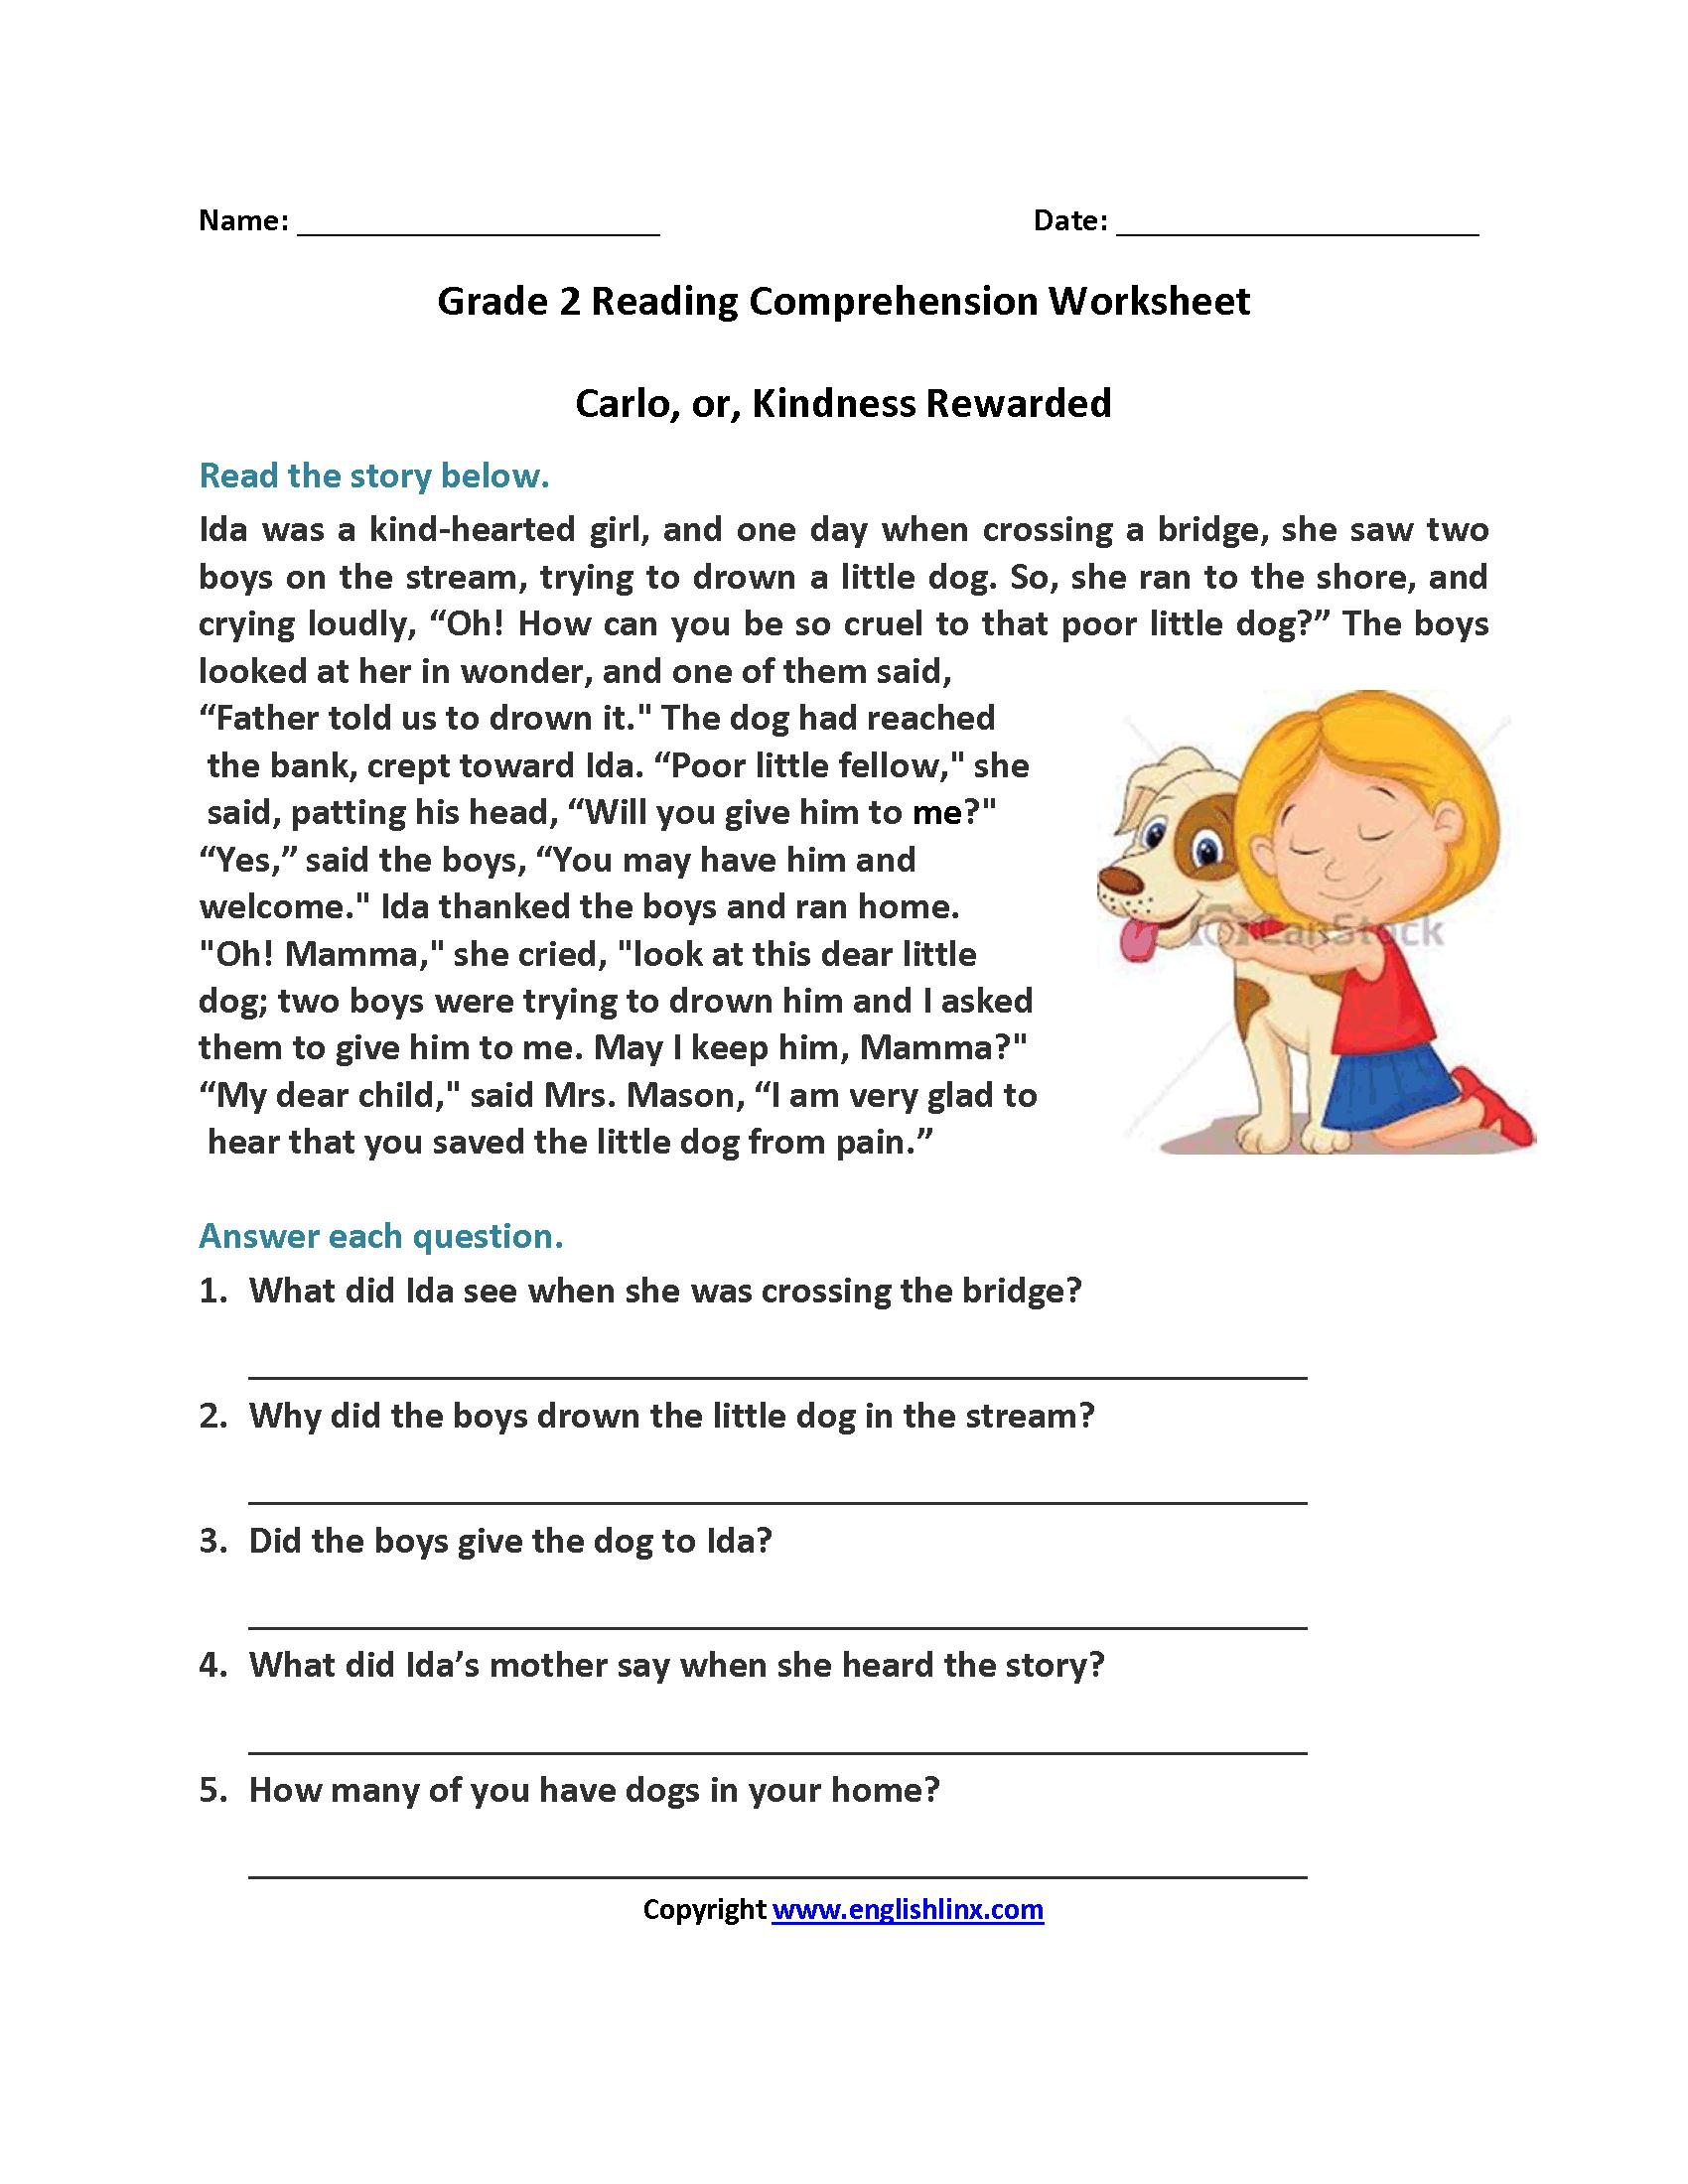 Free Printable Comprehension Worksheets For 5th Grade